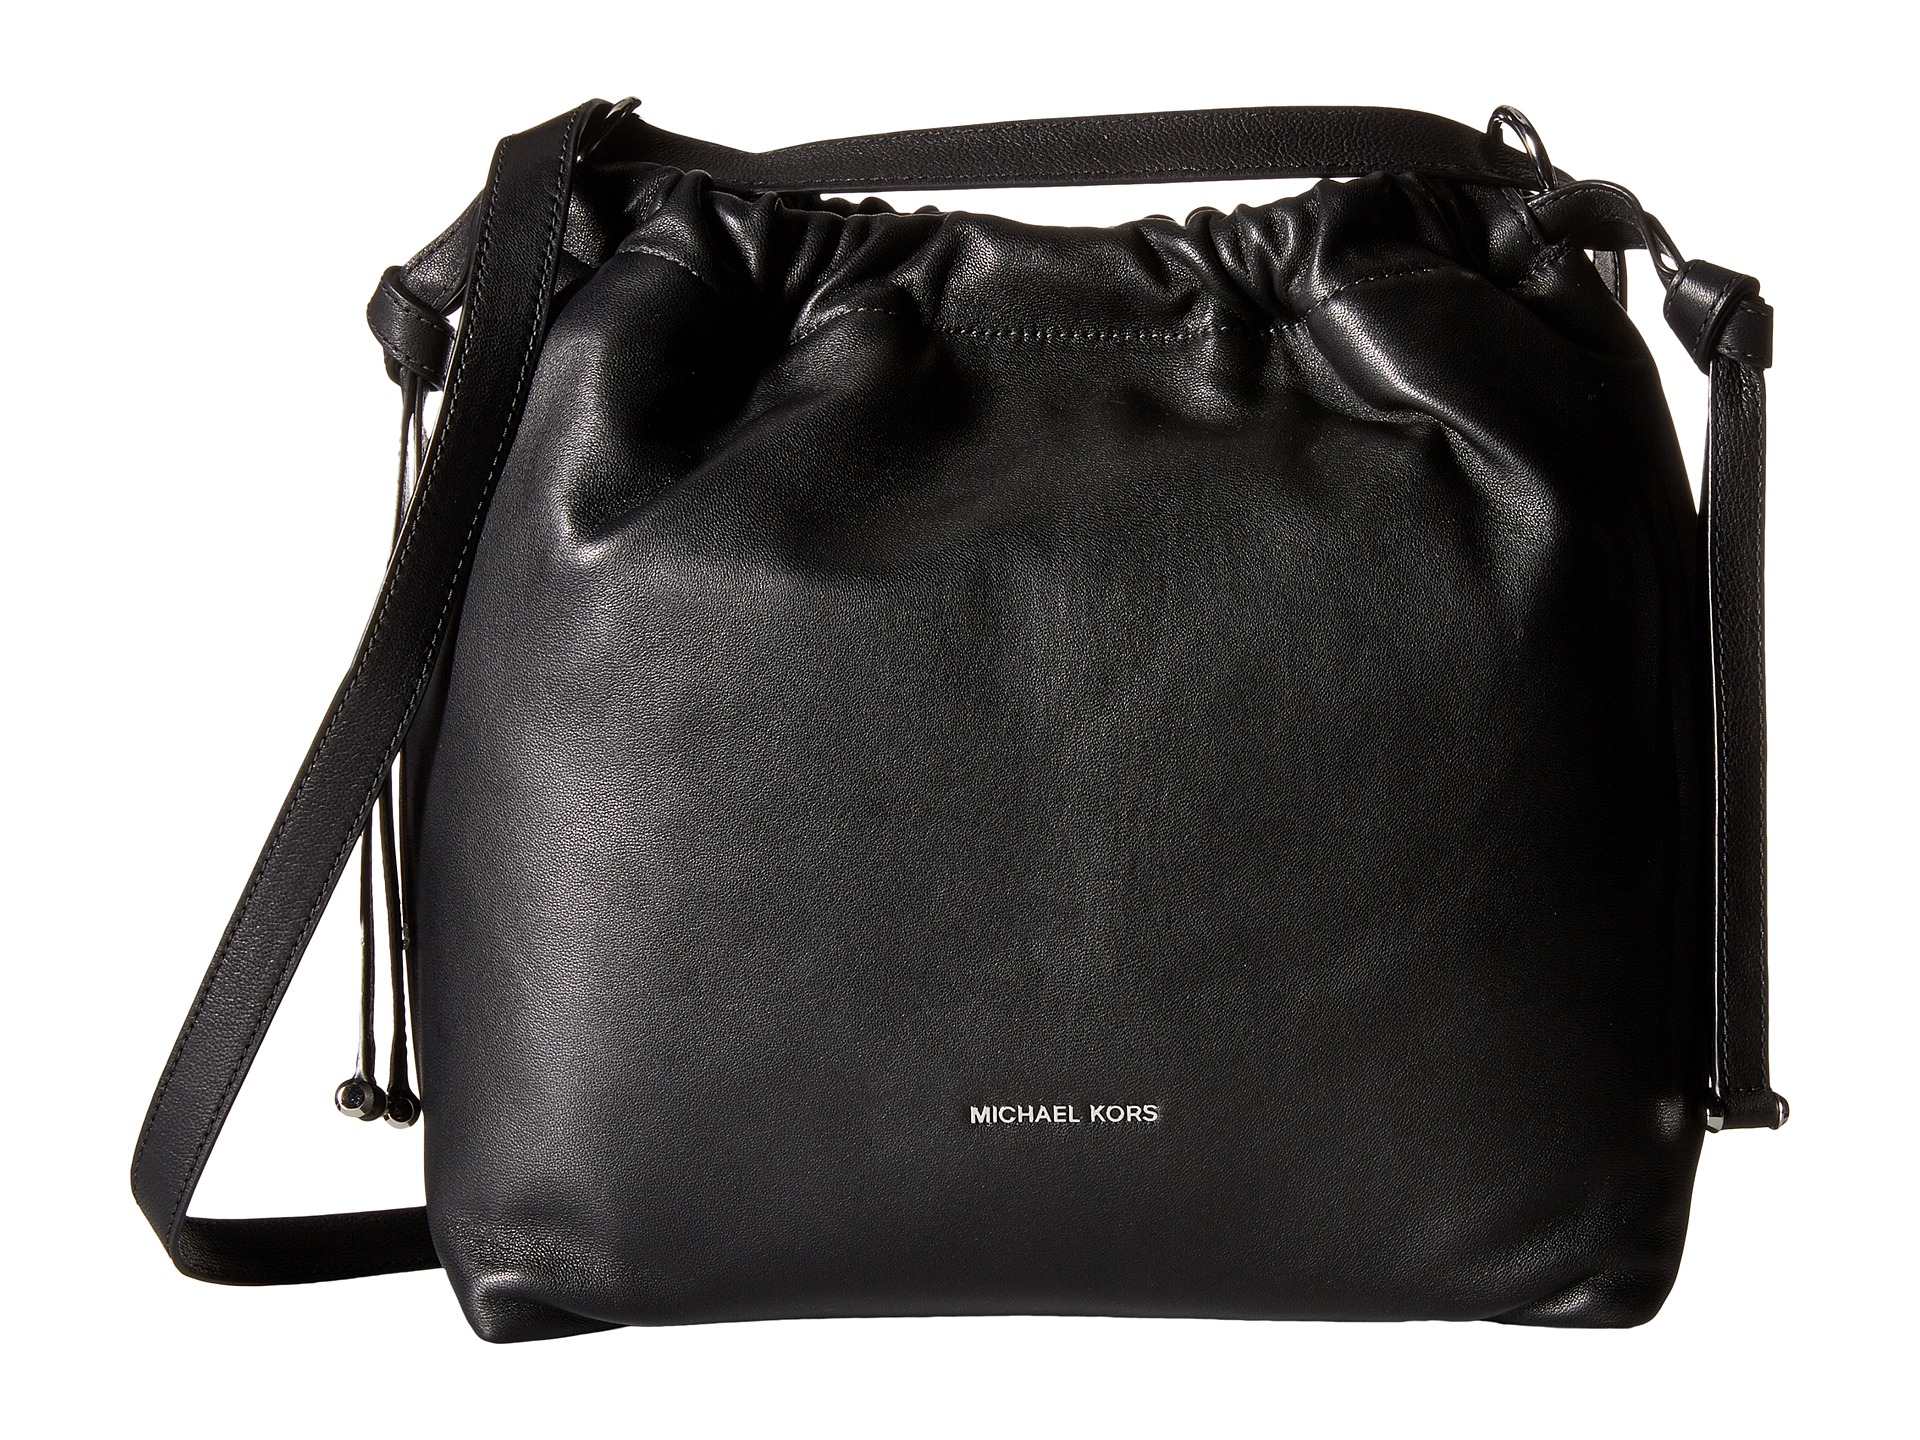 Michael Kors Bag Warranty